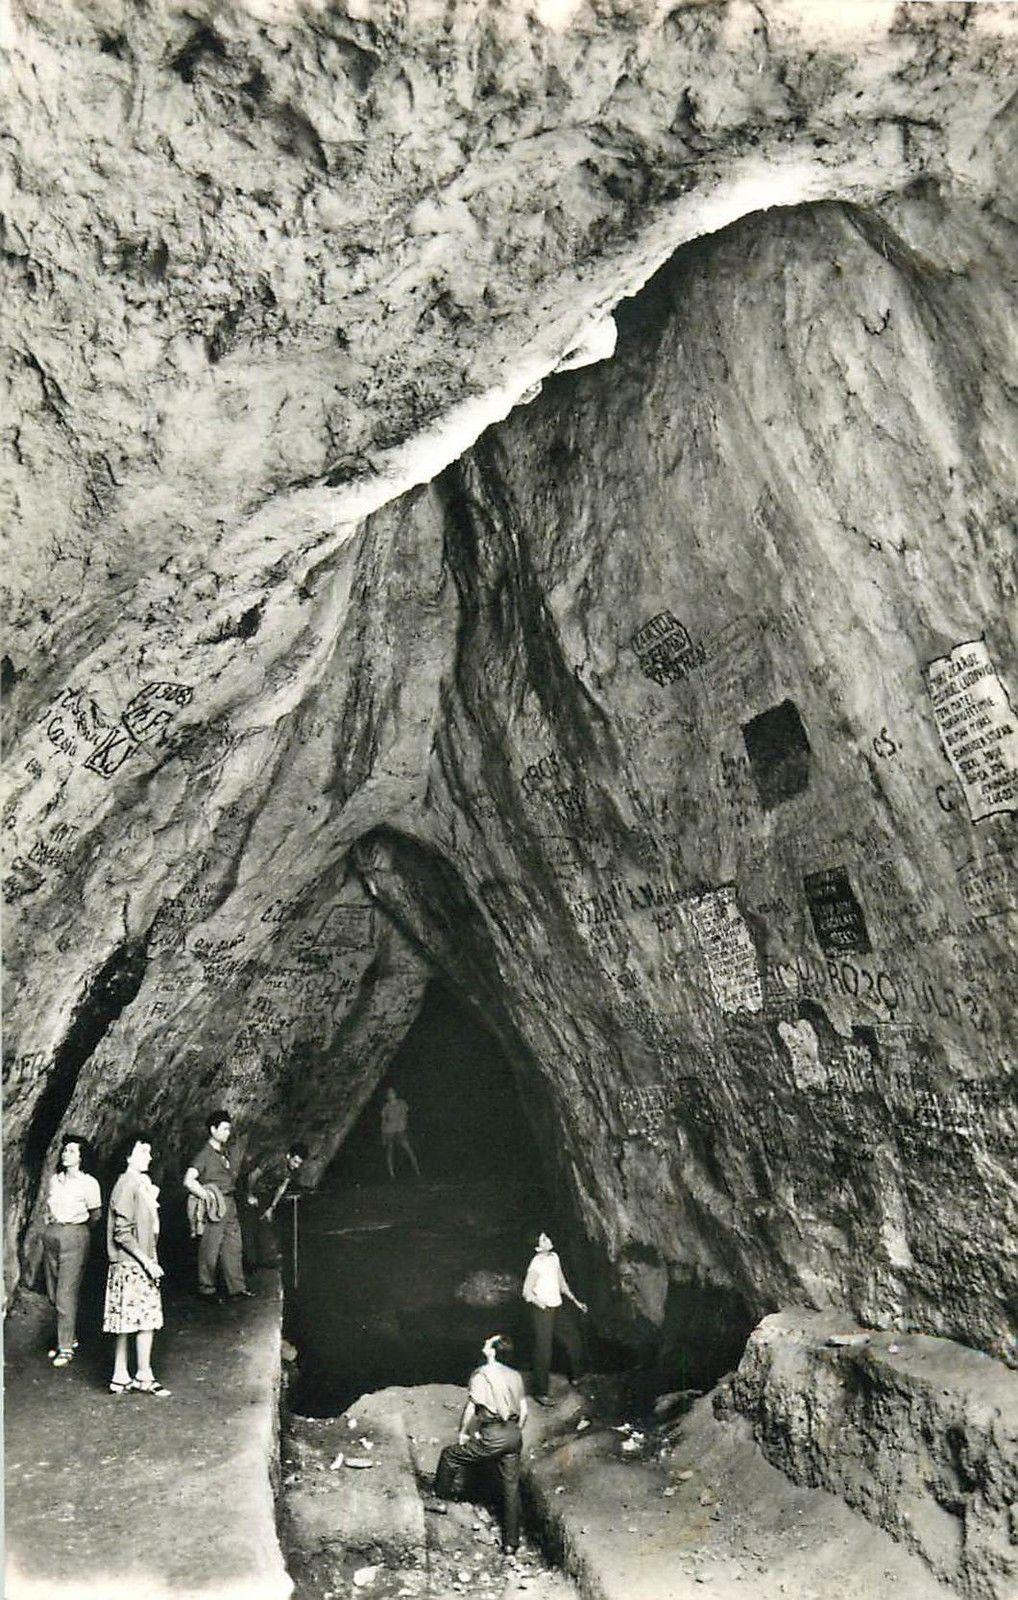 Romania Baile Herculane Grota haiducilor 1960s real photo postcard cave interior / HipPostcard